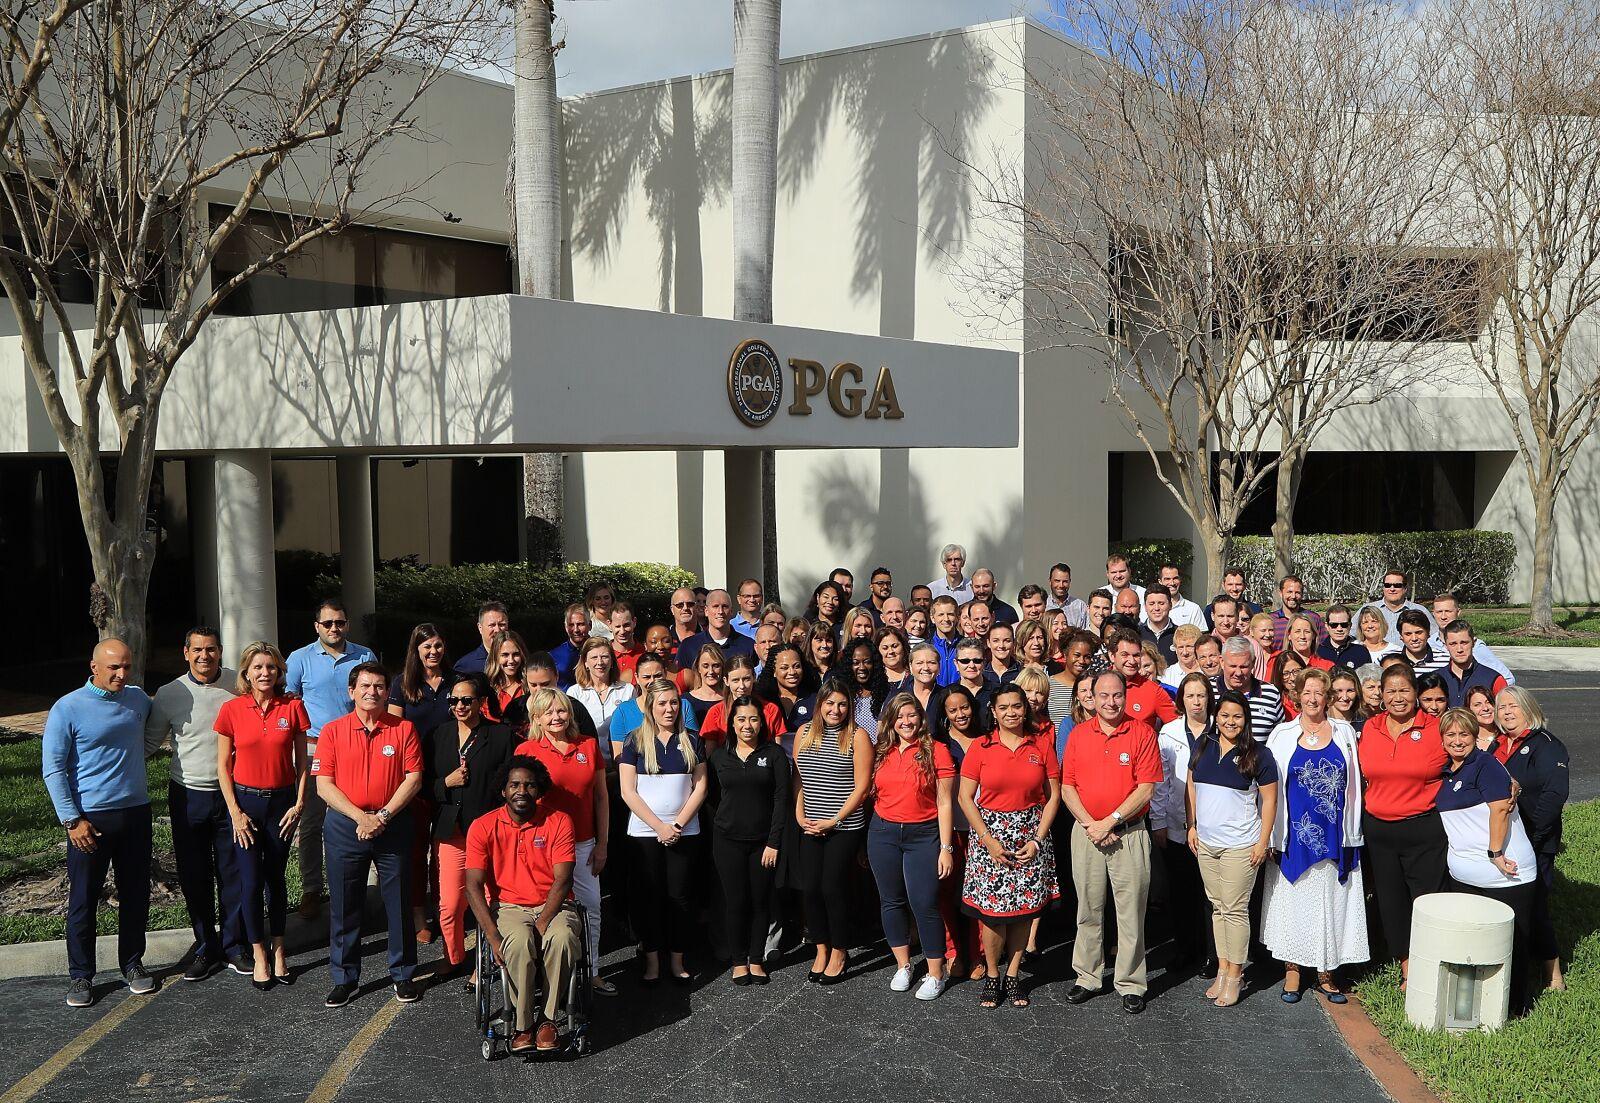 PGA of America bringing headquarters, tournaments to Texas